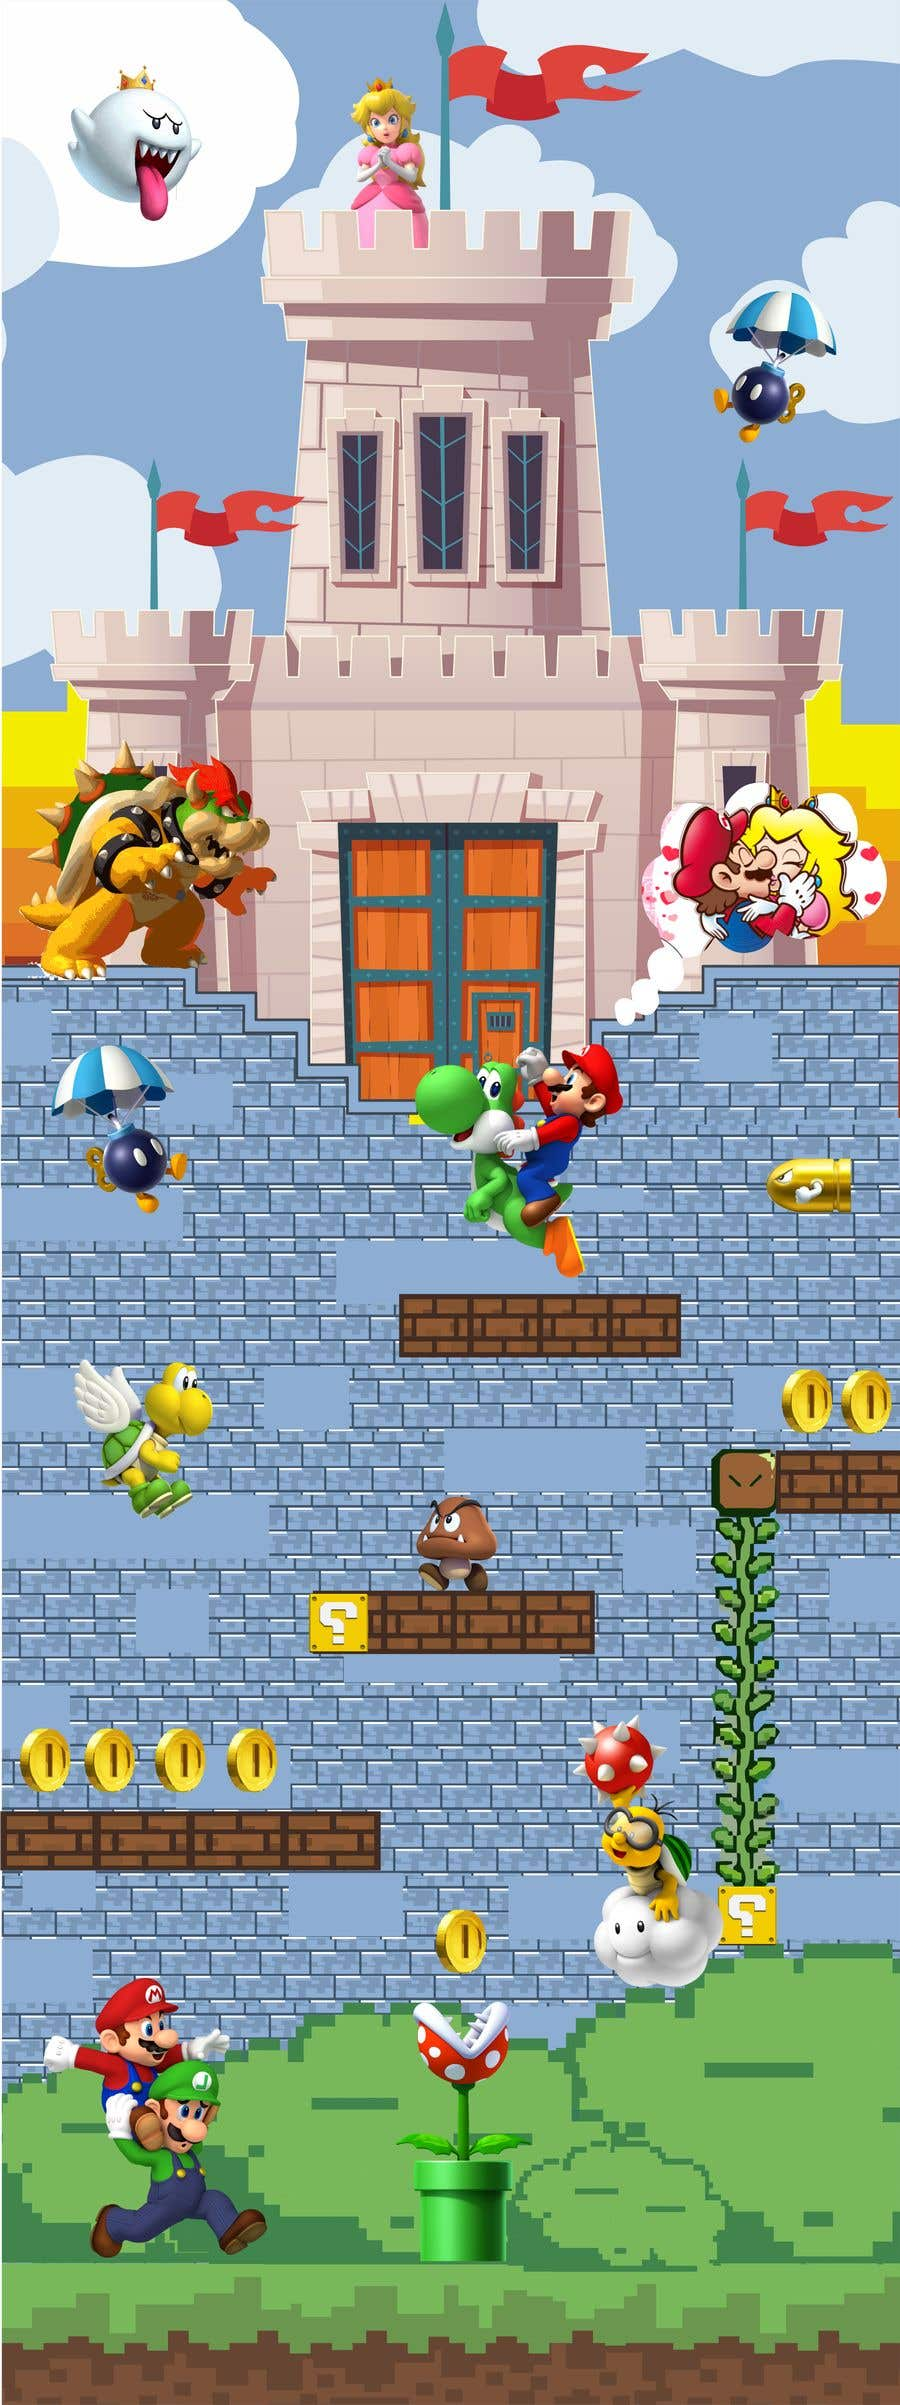 Penyertaan Peraduan #                                        13                                      untuk                                         Build a wall design for my house - Mario bross as an example